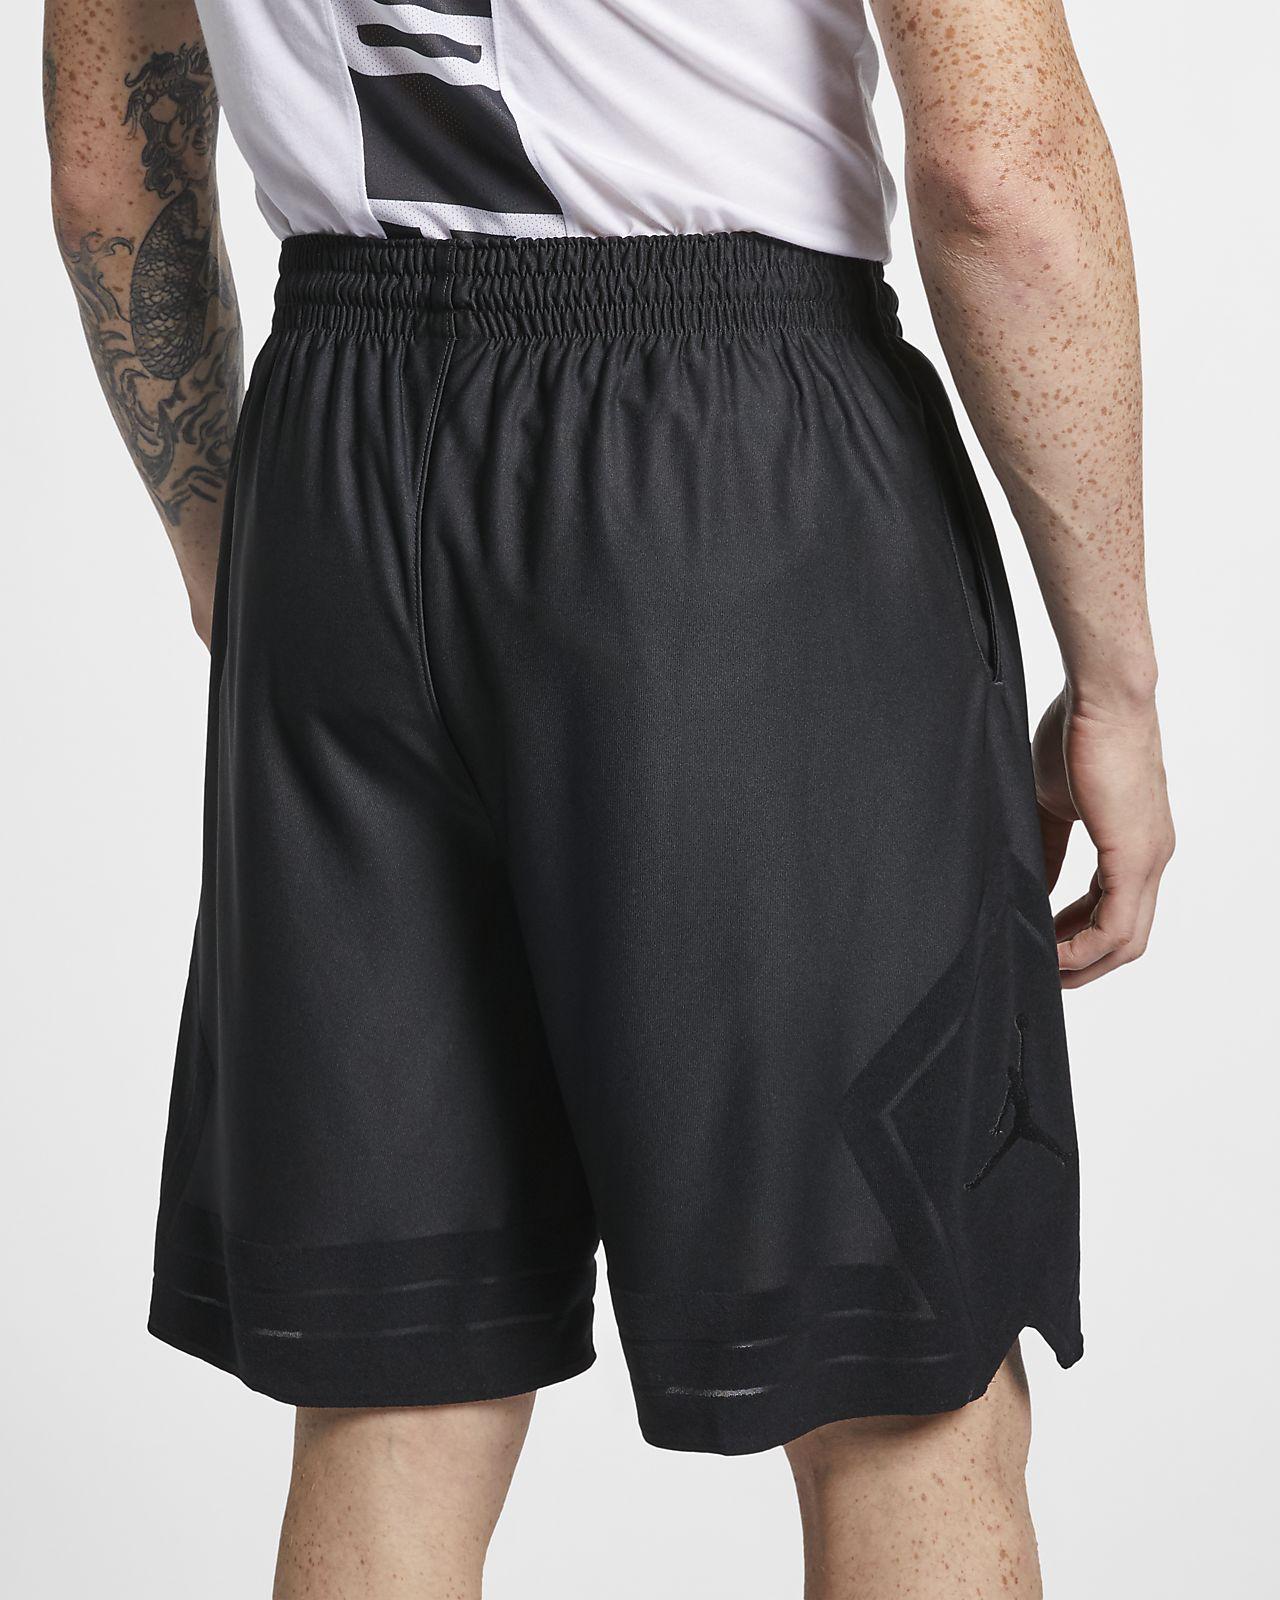 7748e8973e29 Jordan Game Men s Basketball Shorts. Nike.com CA